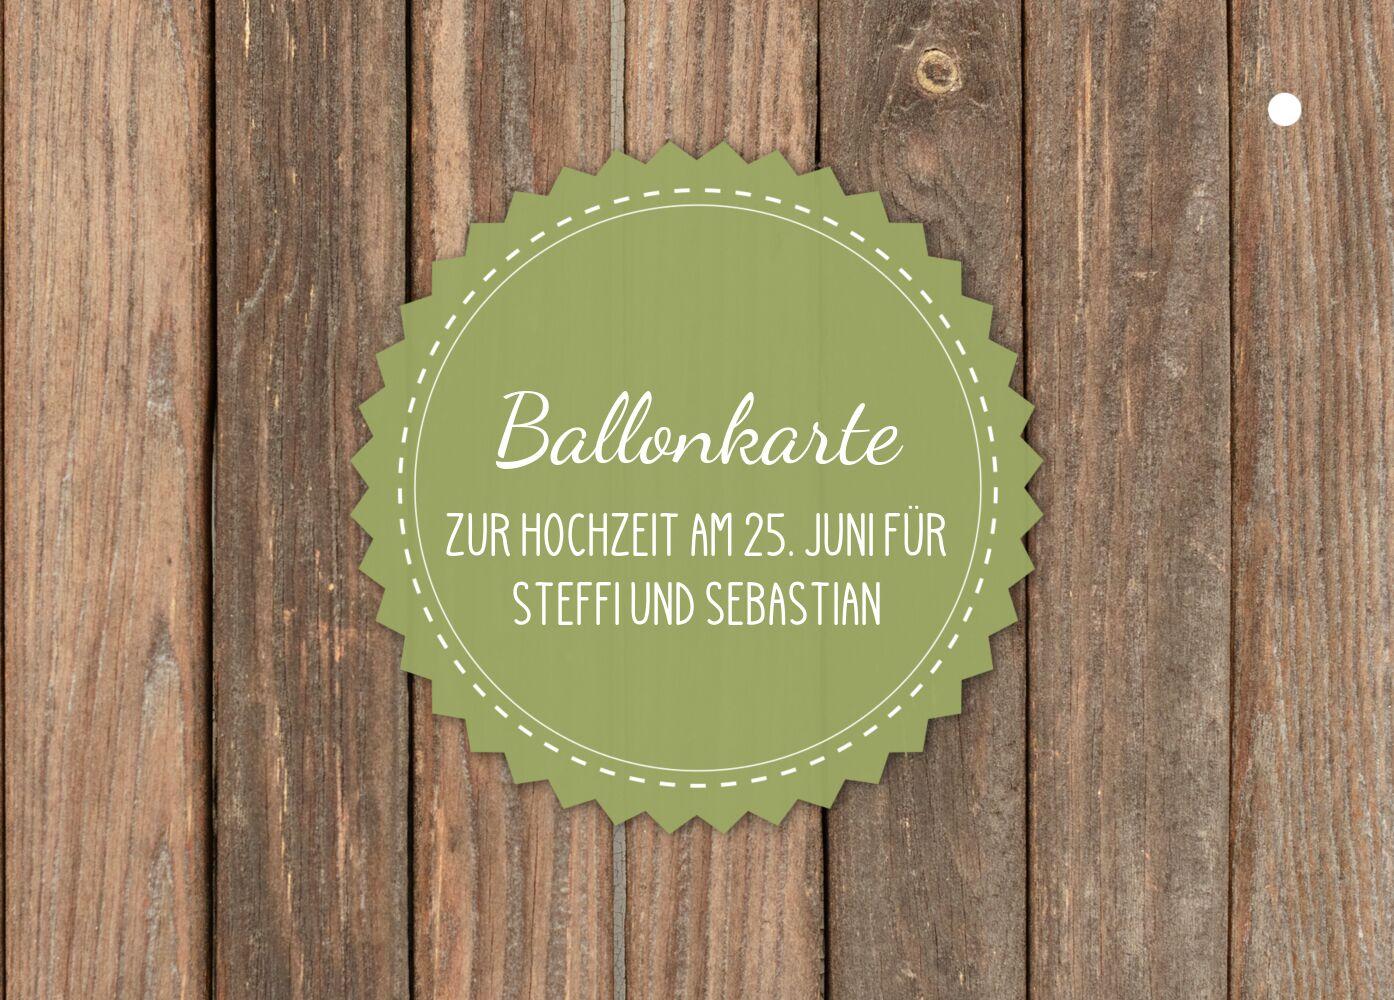 Ansicht 2 - Ballonkarte Vintage Holz